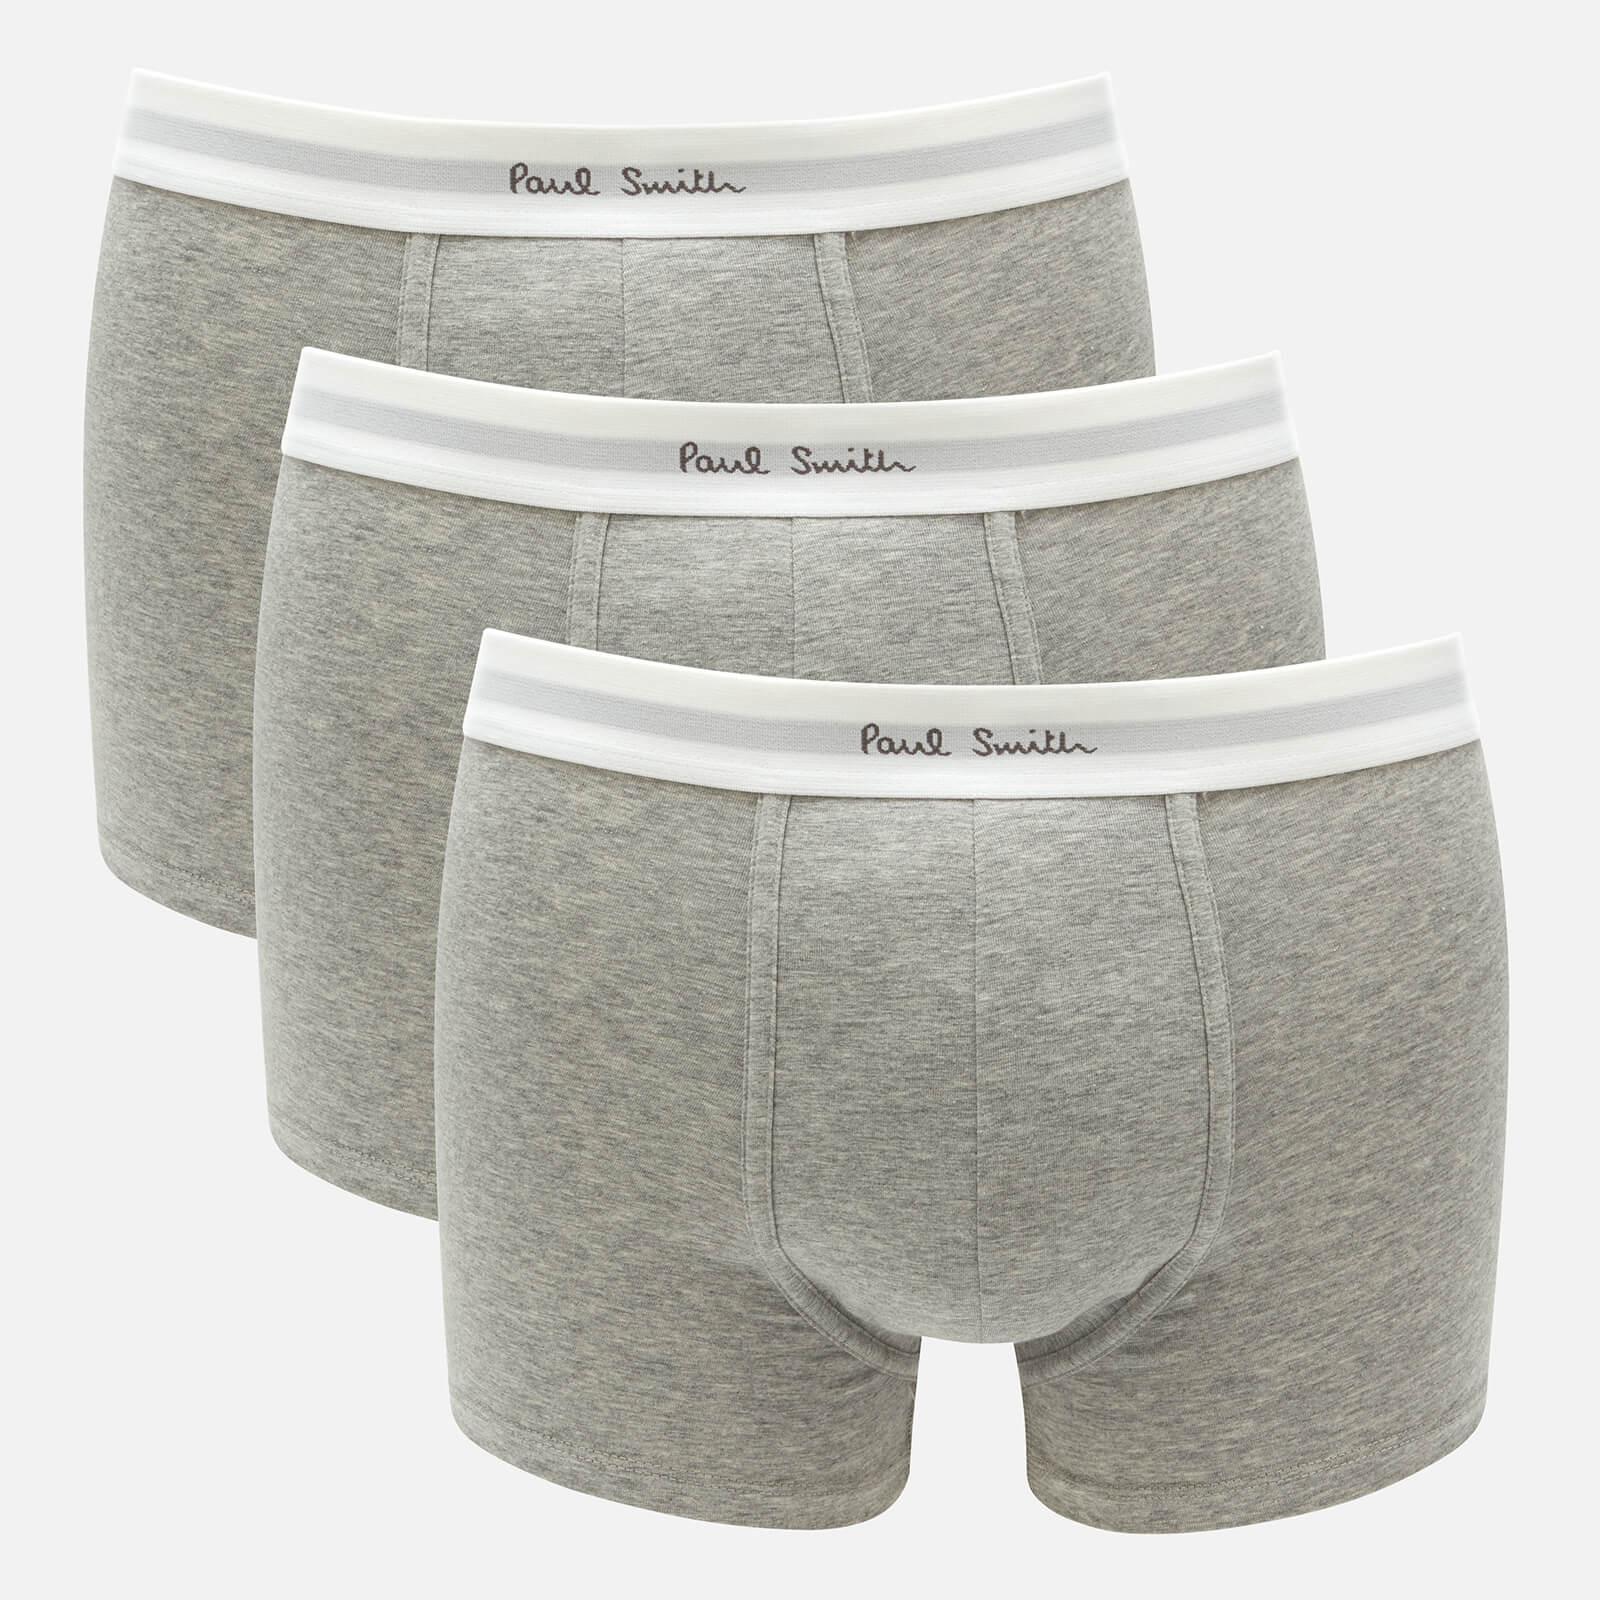 Ps Paul Smith Men's 3-Pack Boxer Breifs - Grey - S